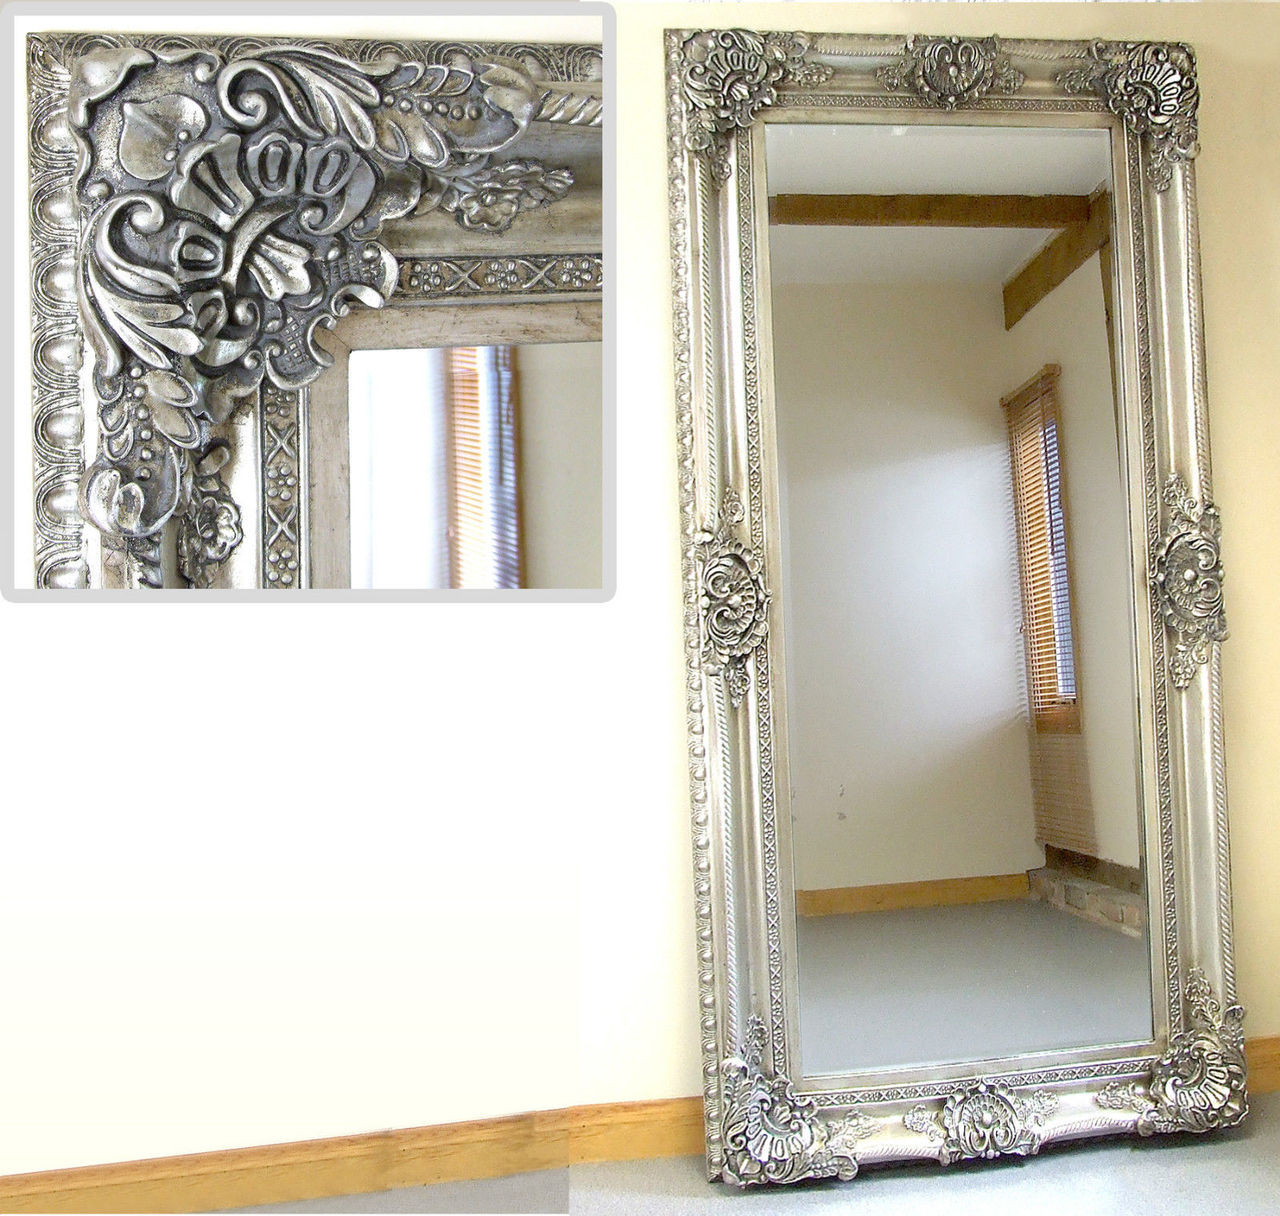 Wondrous Seville Large Shabby Chic Vinatge Full Length Wall Leaner Download Free Architecture Designs Scobabritishbridgeorg